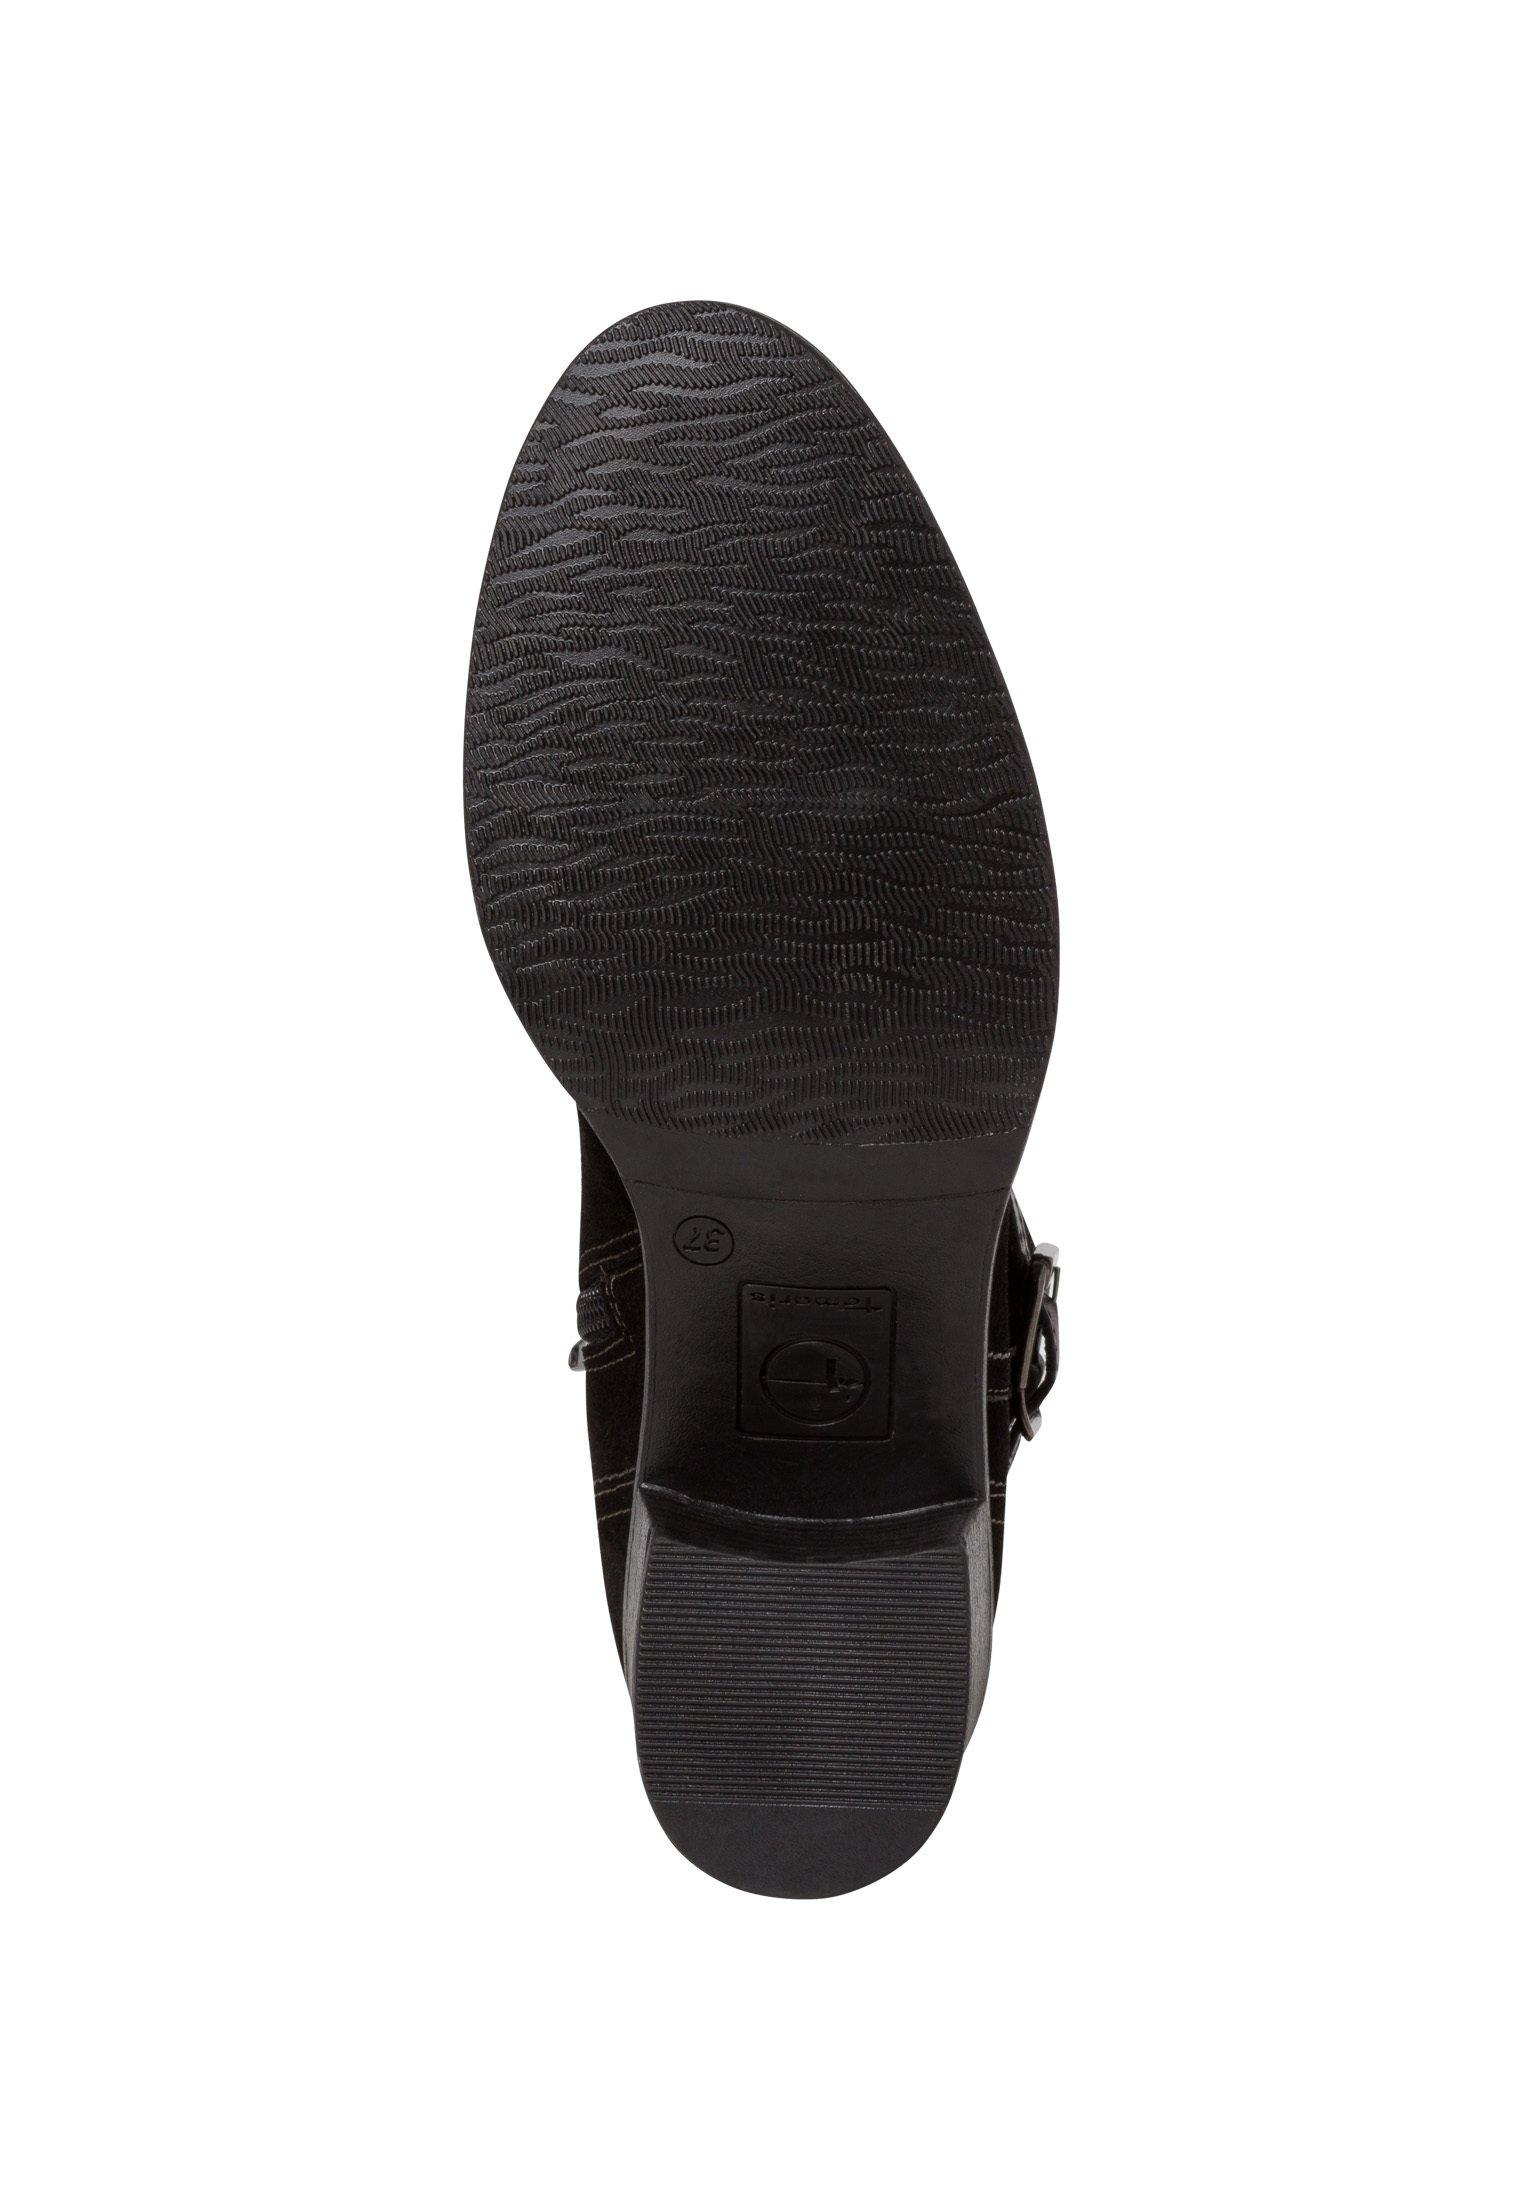 Tamaris Ankle Boot black suede/schwarz meliert